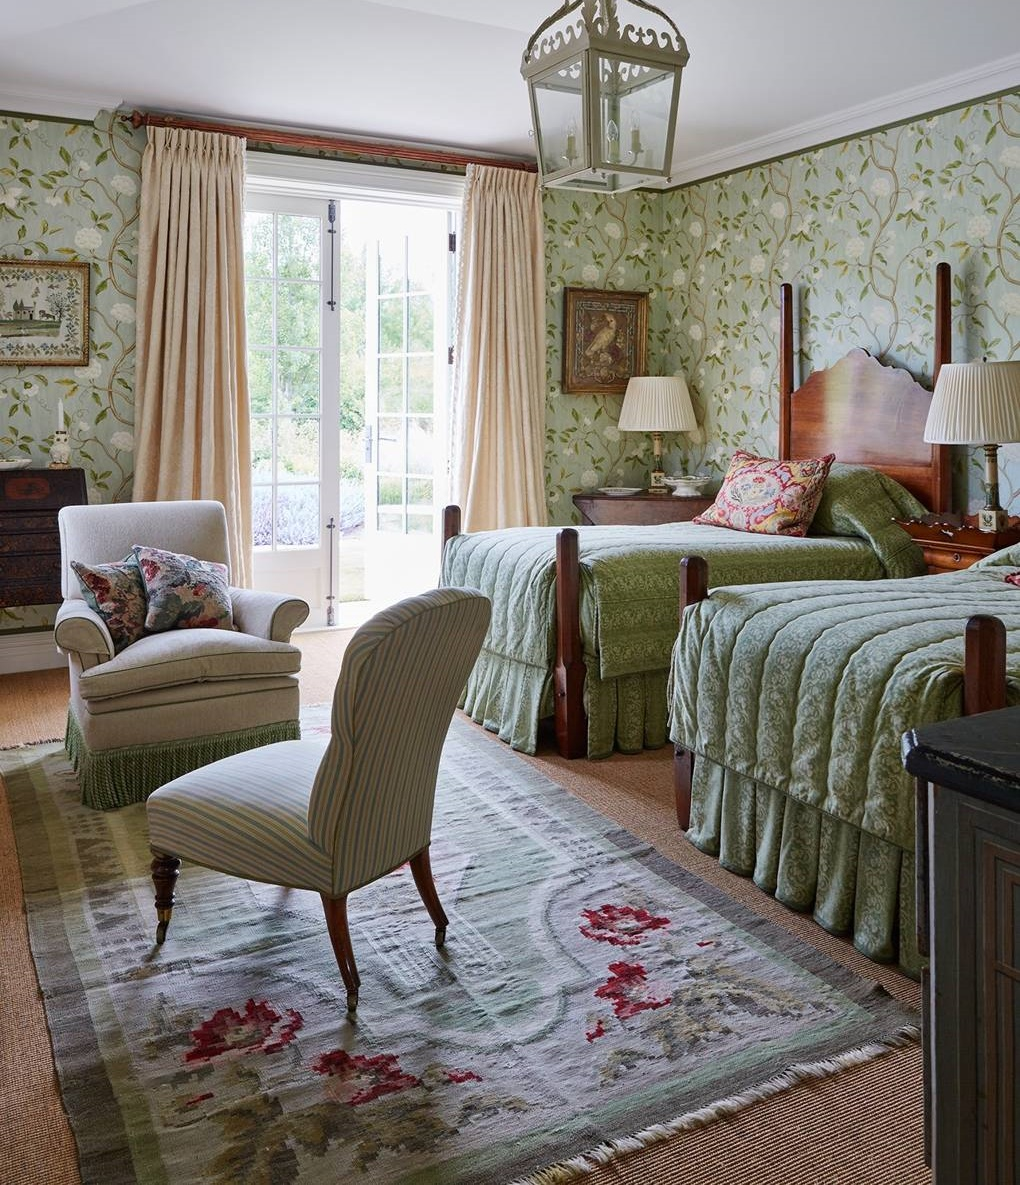 Green Floral Bedroom Decor